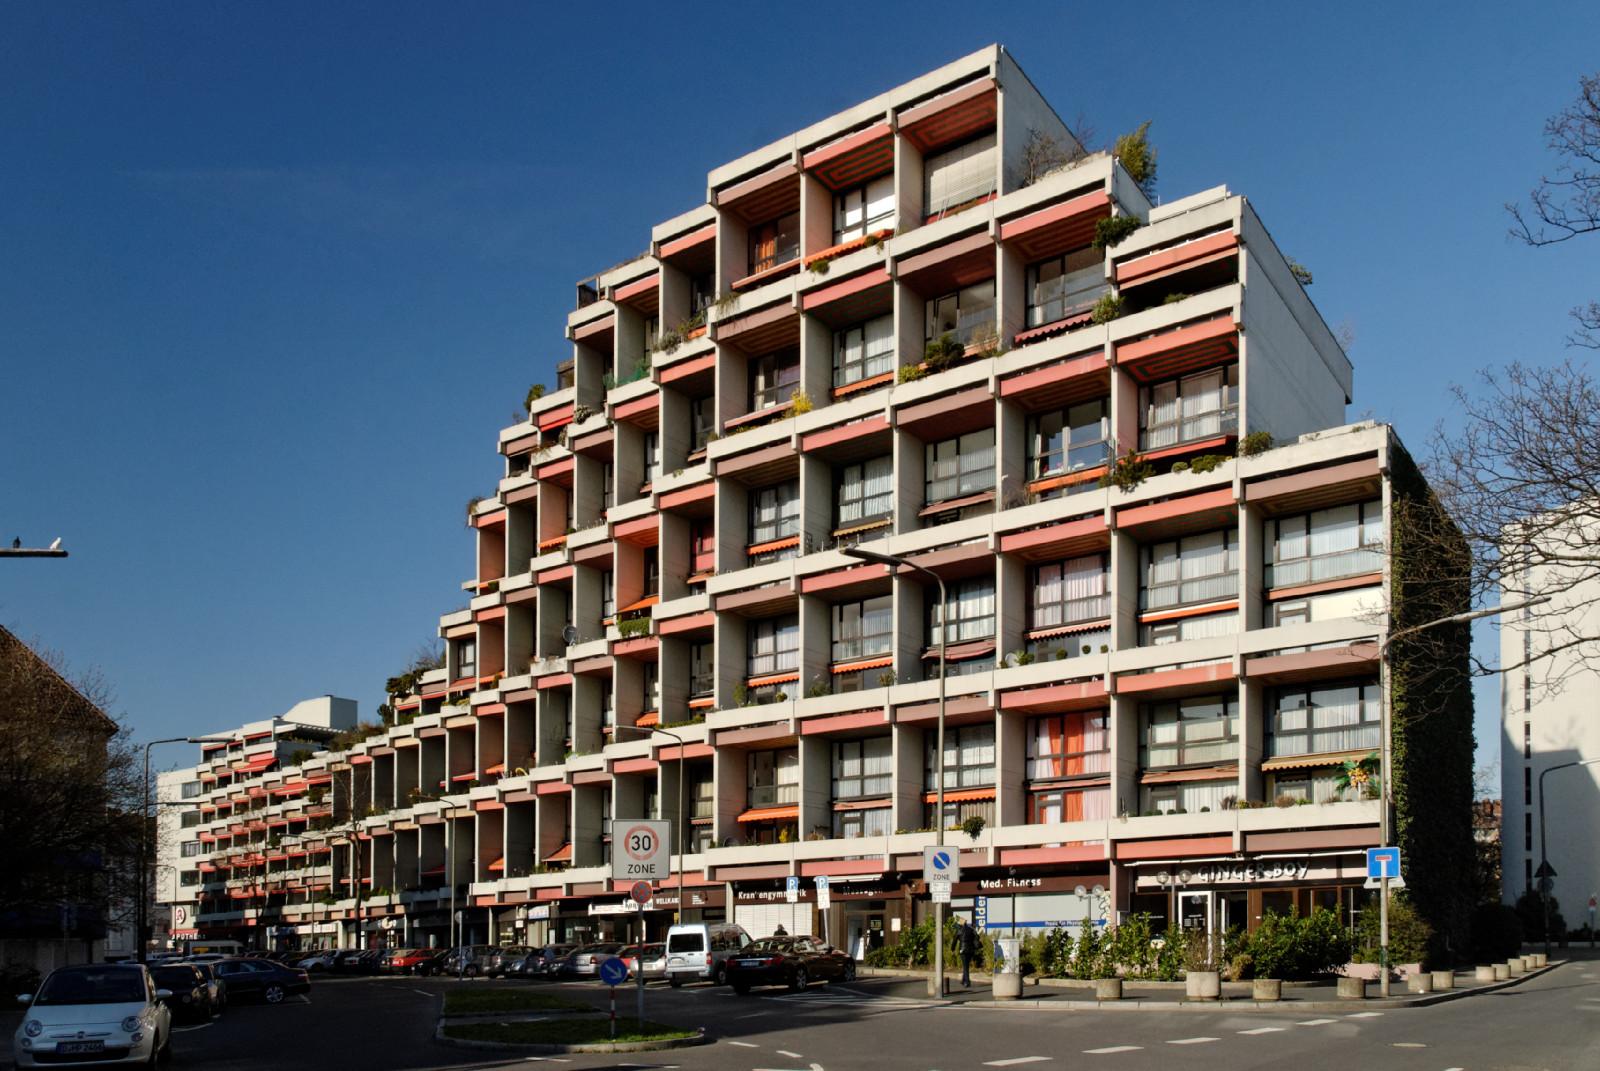 Magic Cristal Park Hotel Thomas Cook